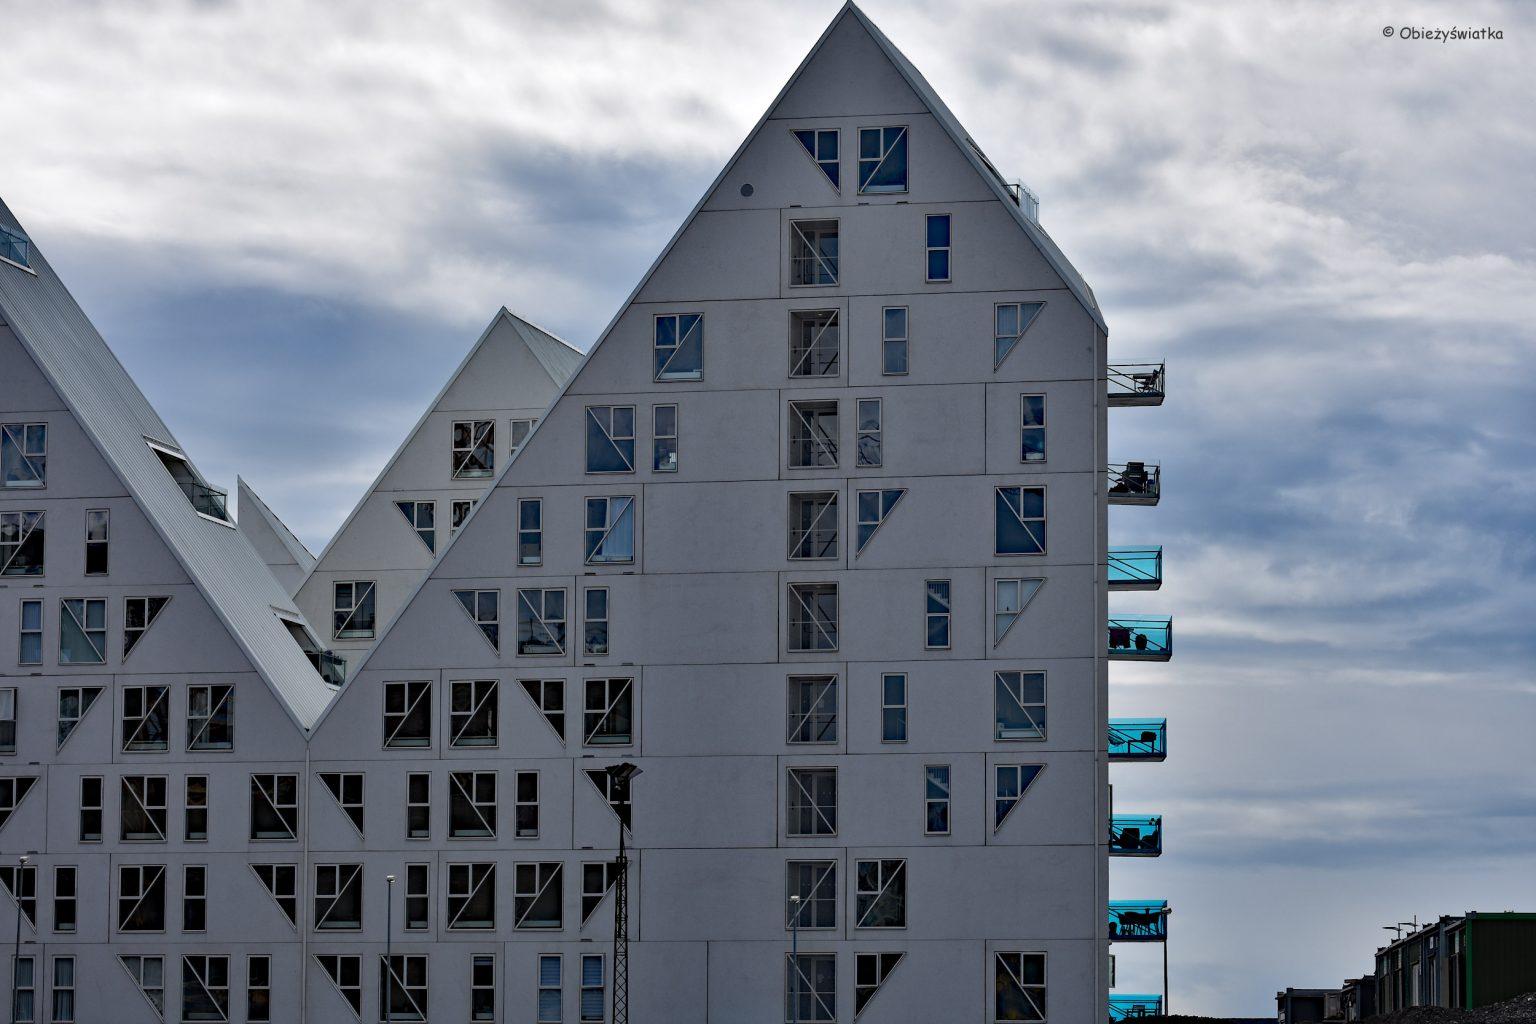 Isbjerget - Góra Lodowa, Aarhus, Dania